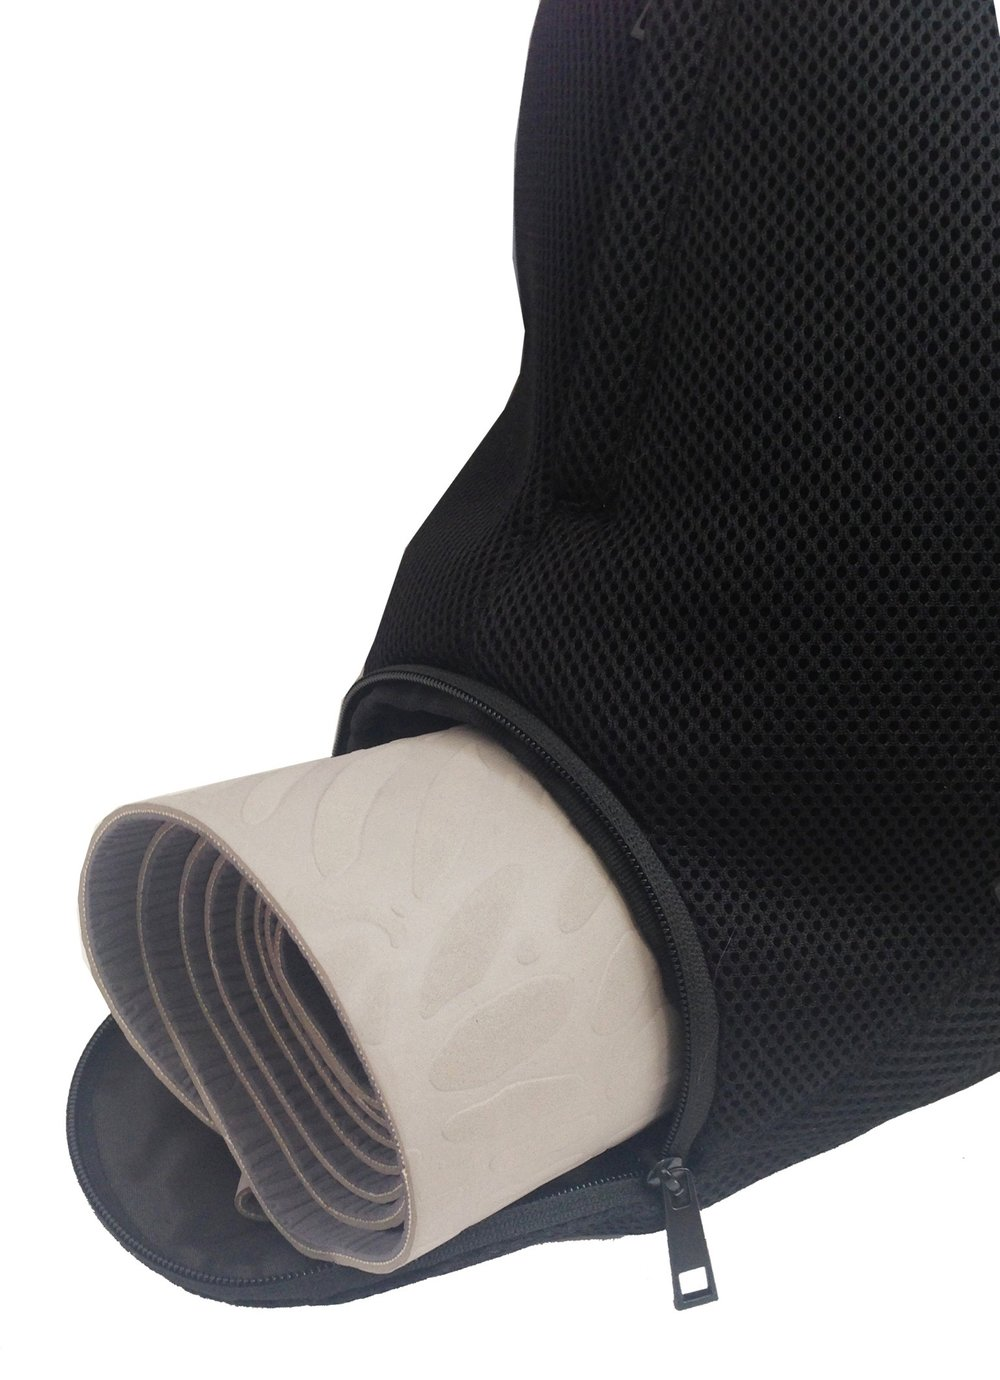 BB-yogamat.jpg